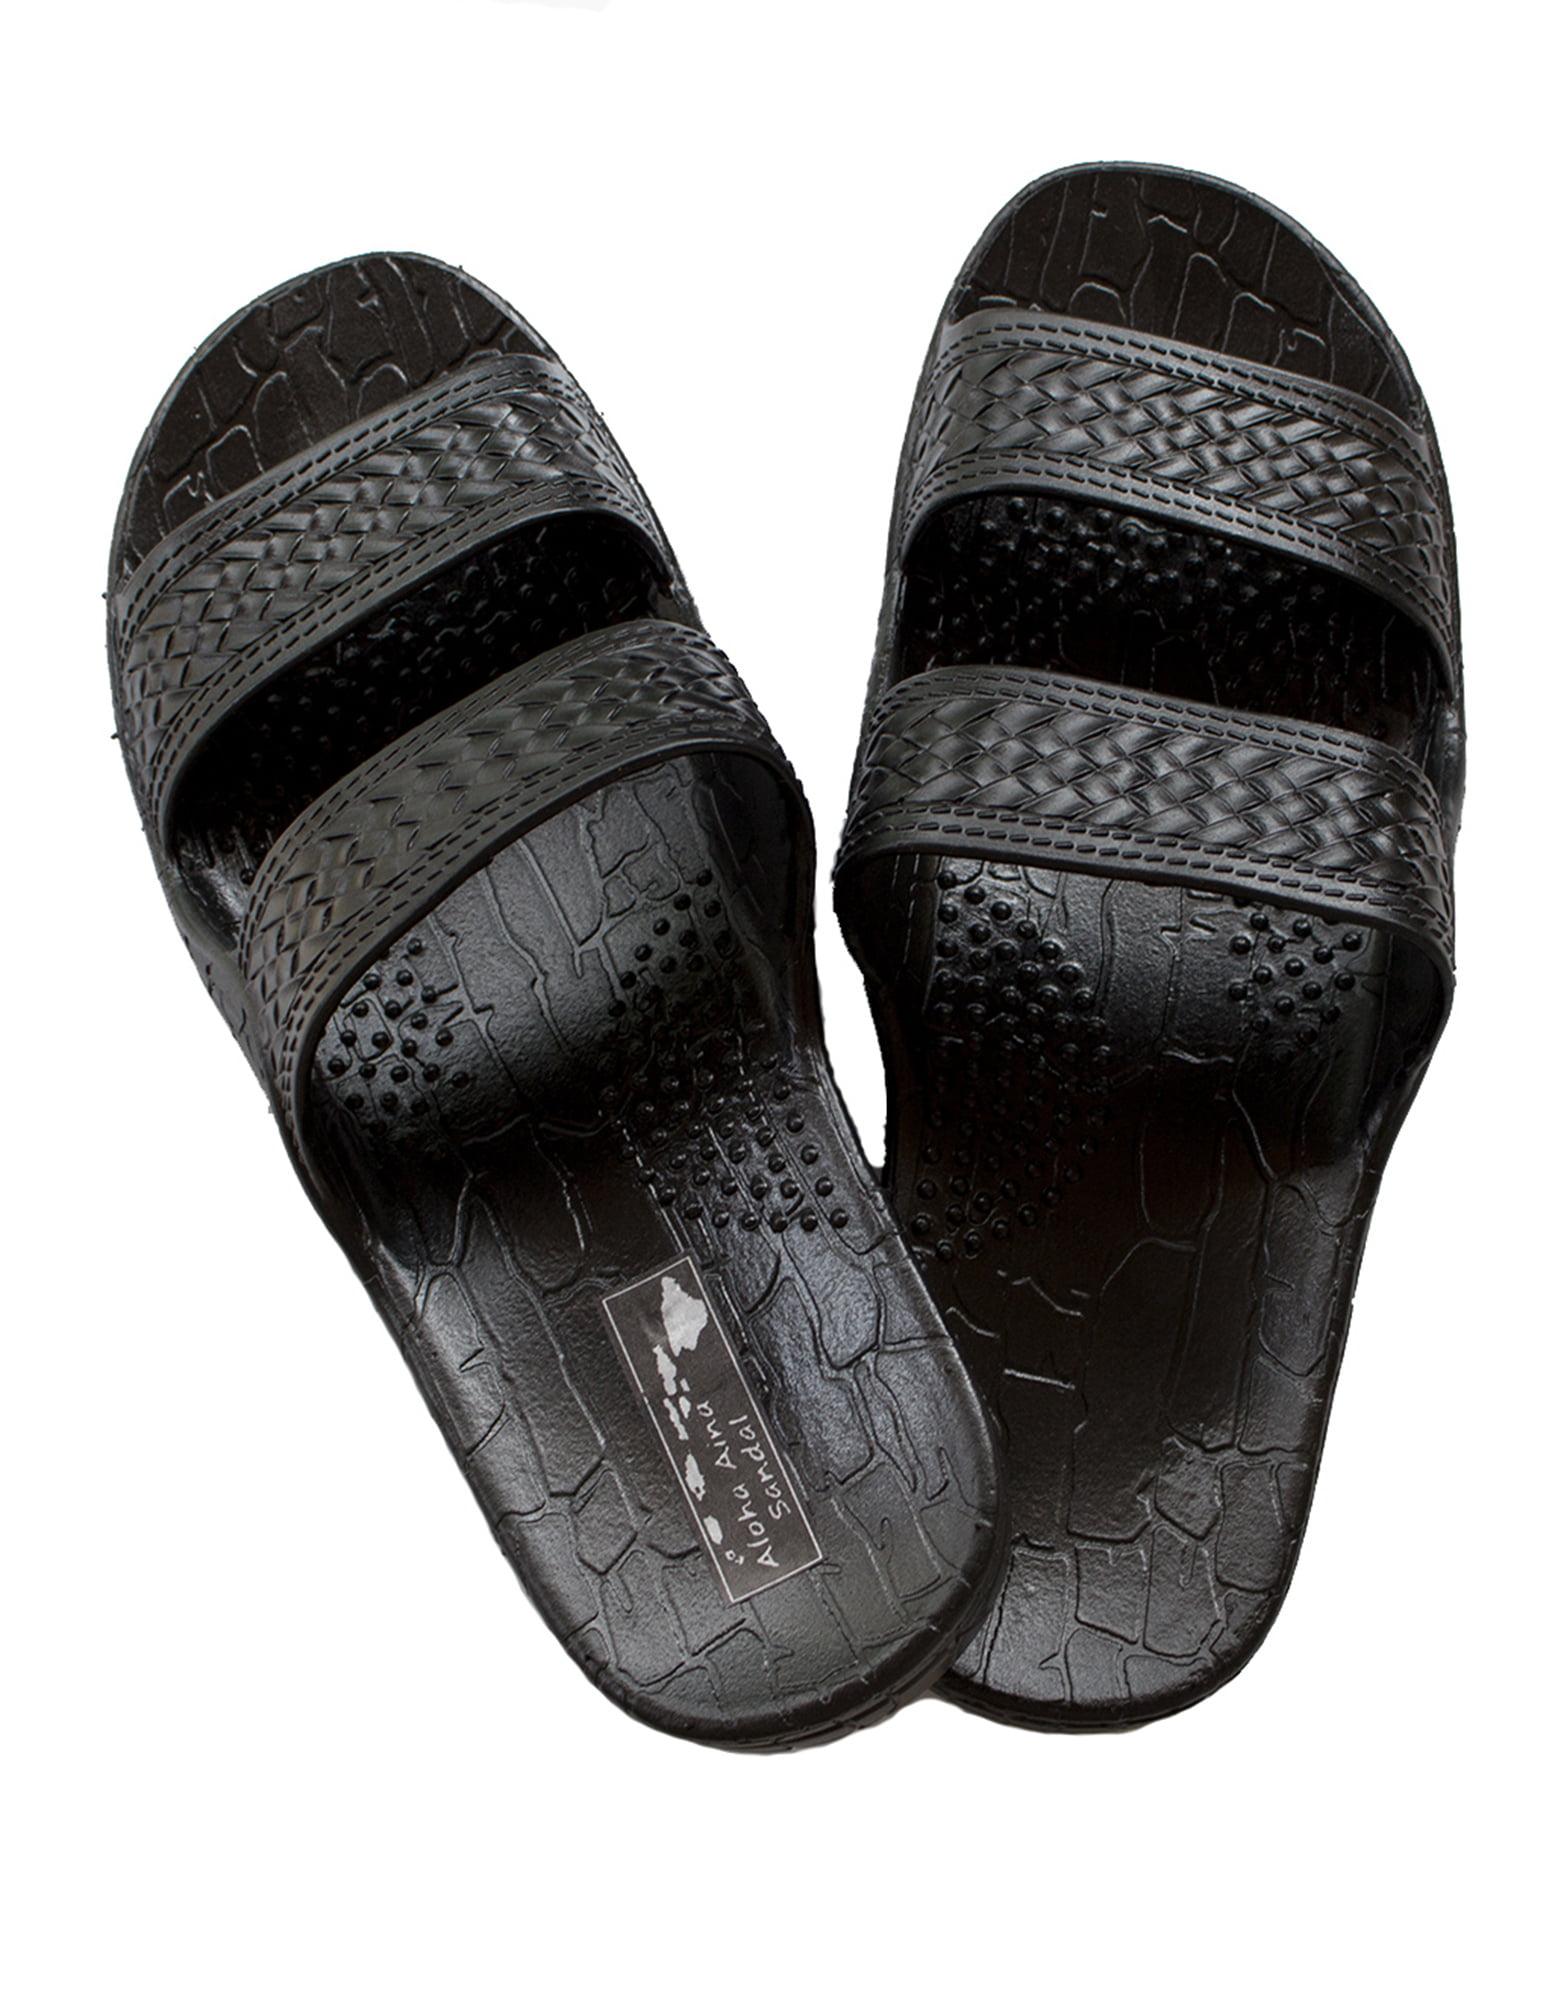 Hawaii Brown and Black Jesus Sandals